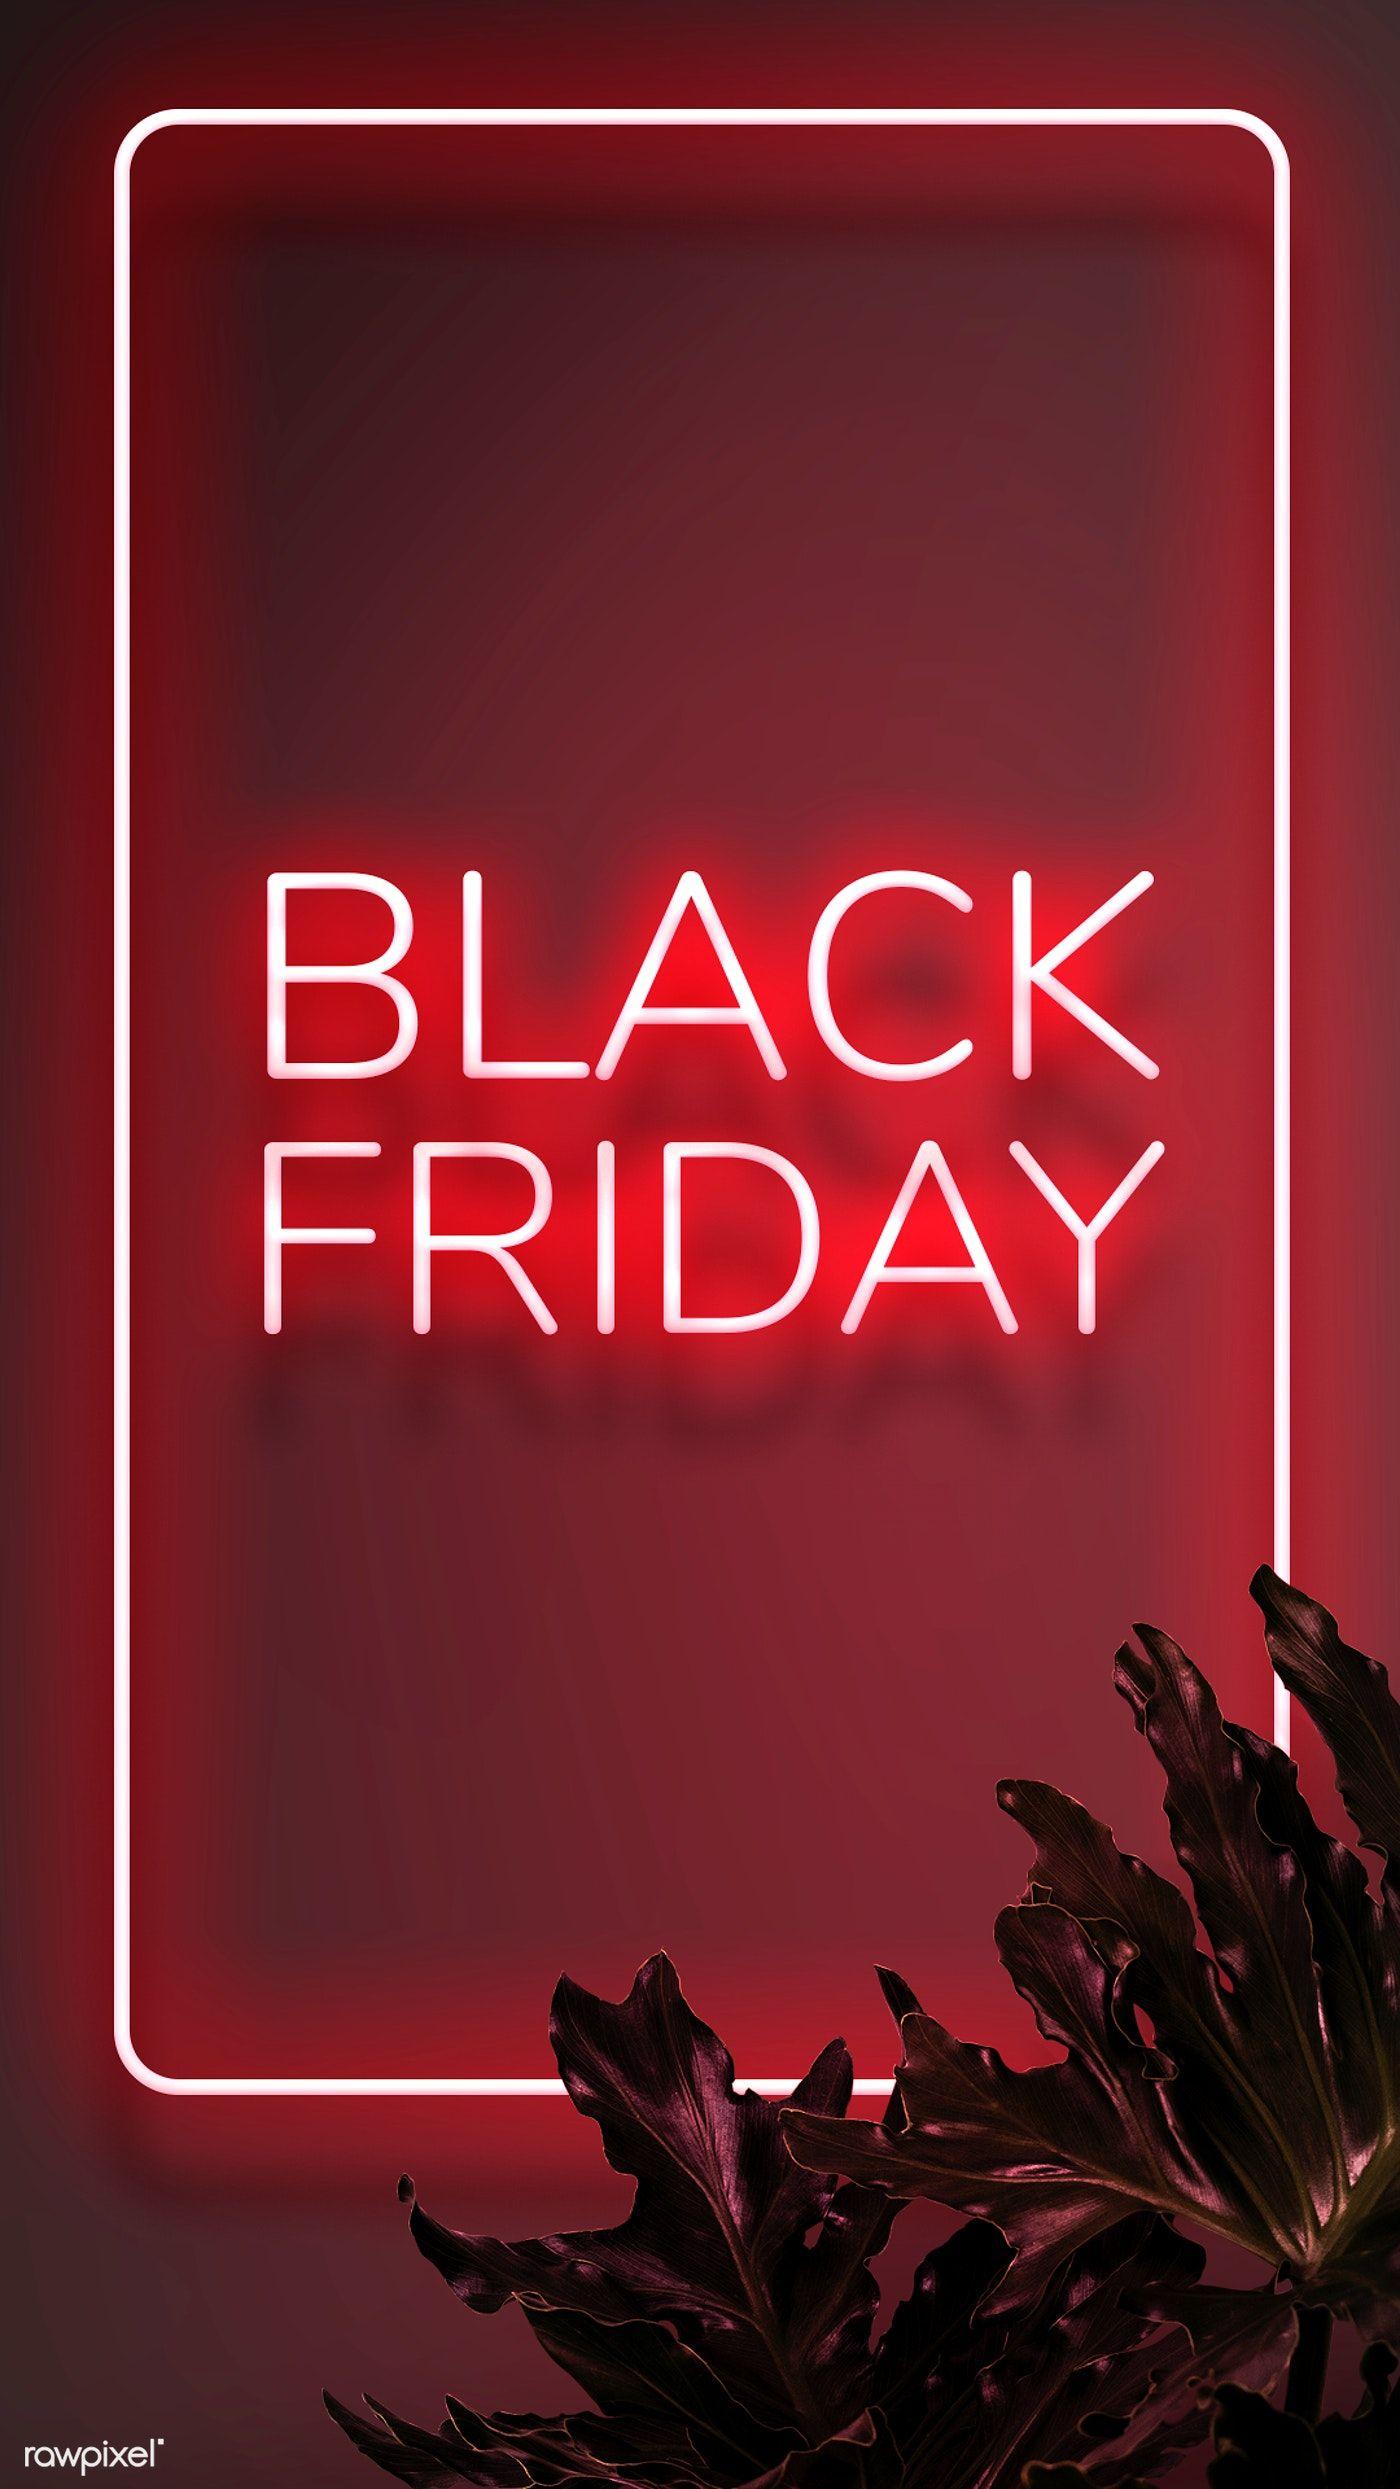 Download Premium Psd Of Floral Mobile Phone Wallpaper Vector 1224806 Black Friday Design Phone Wallpaper Black Friday